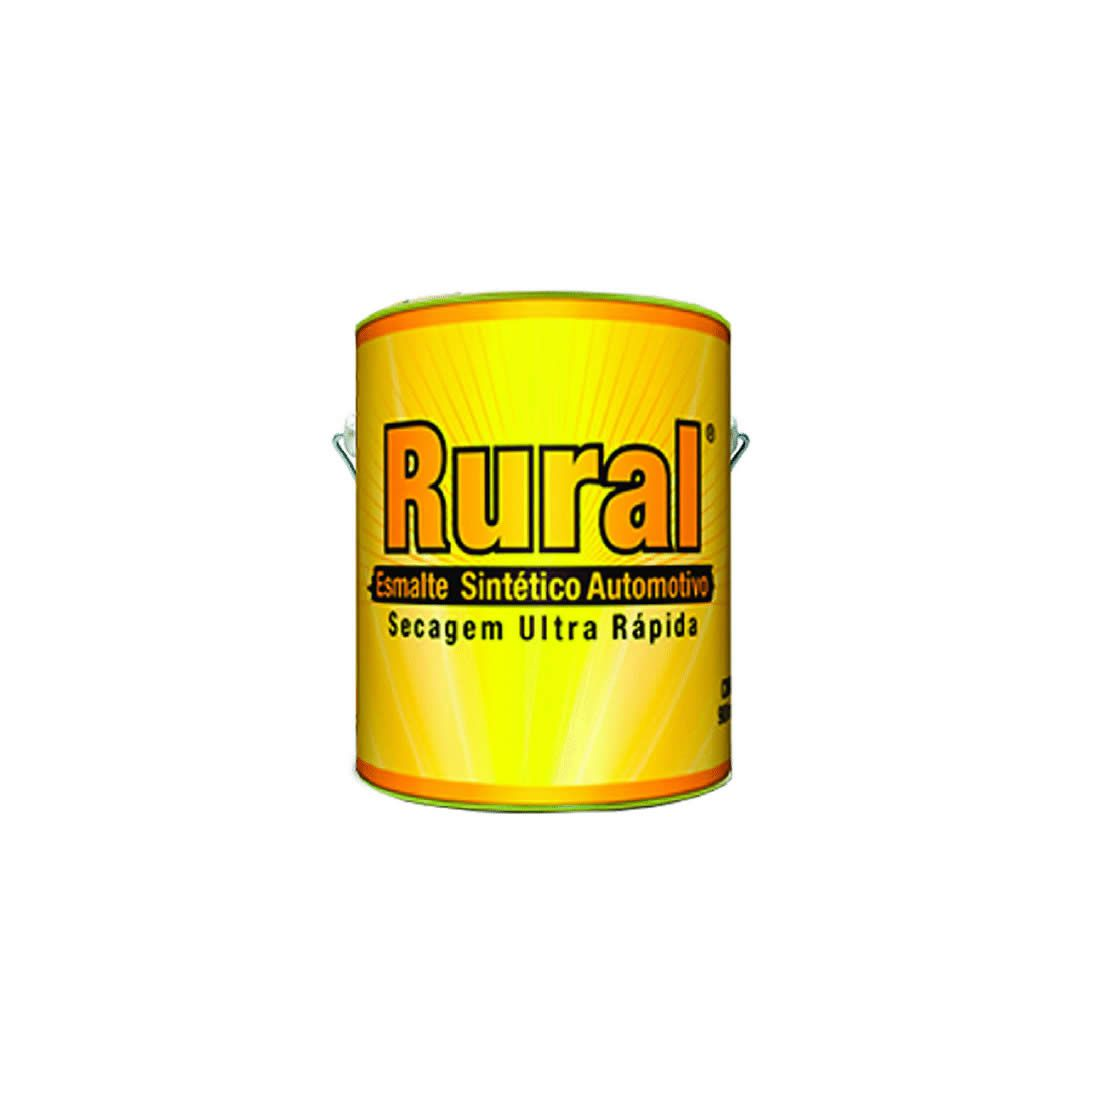 Esmalte Sintético Rural Secagem Ultra Rápido Marrom Avela Metalizado 3,6Lt